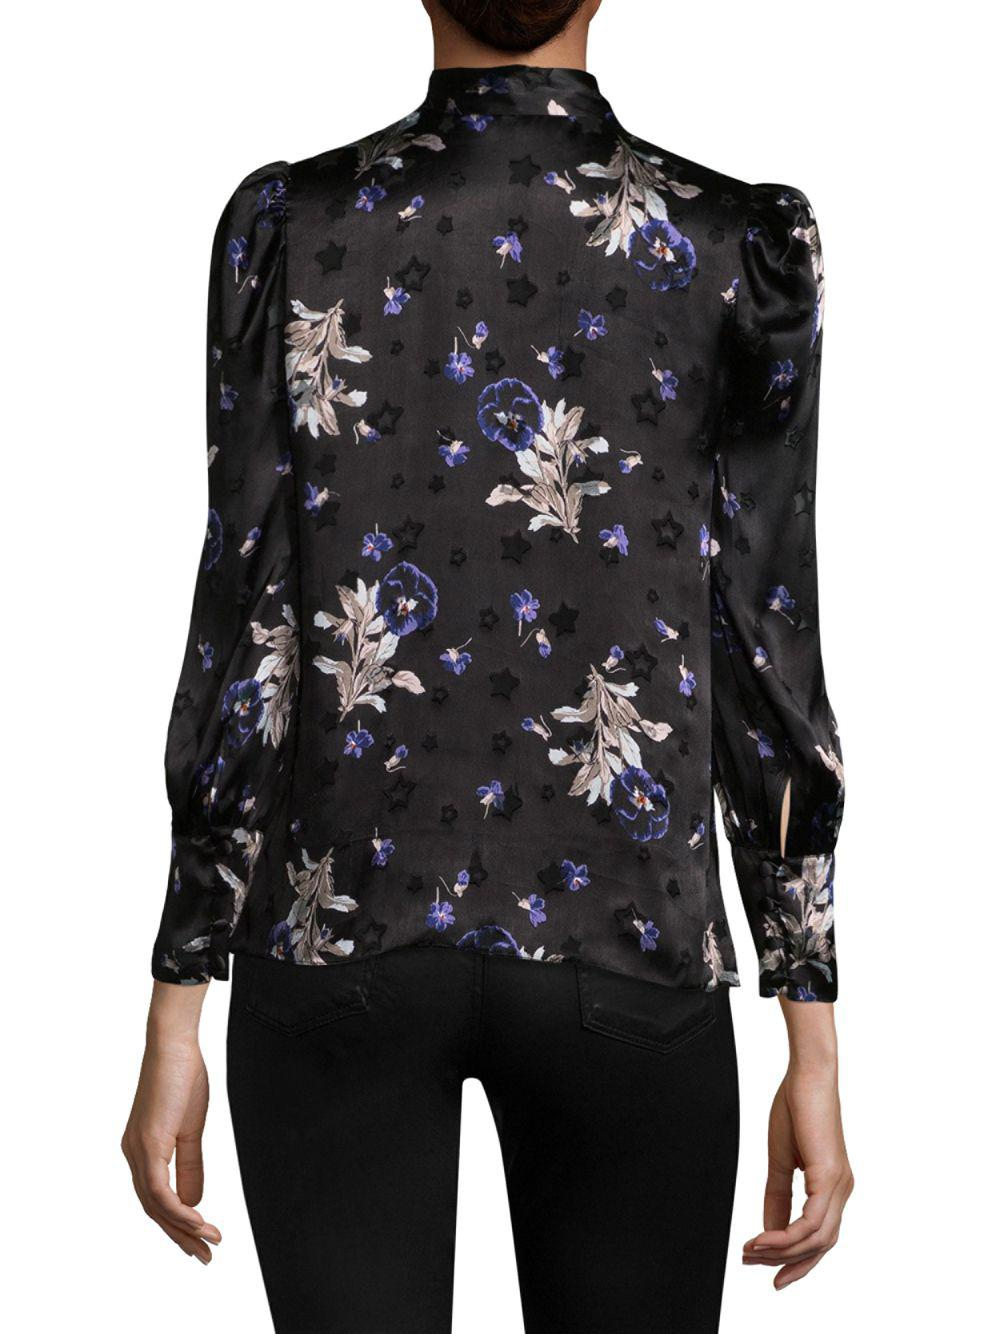 763f732ea3be7 Rebecca Taylor - Black Floral Star Silk Top - Lyst. View fullscreen